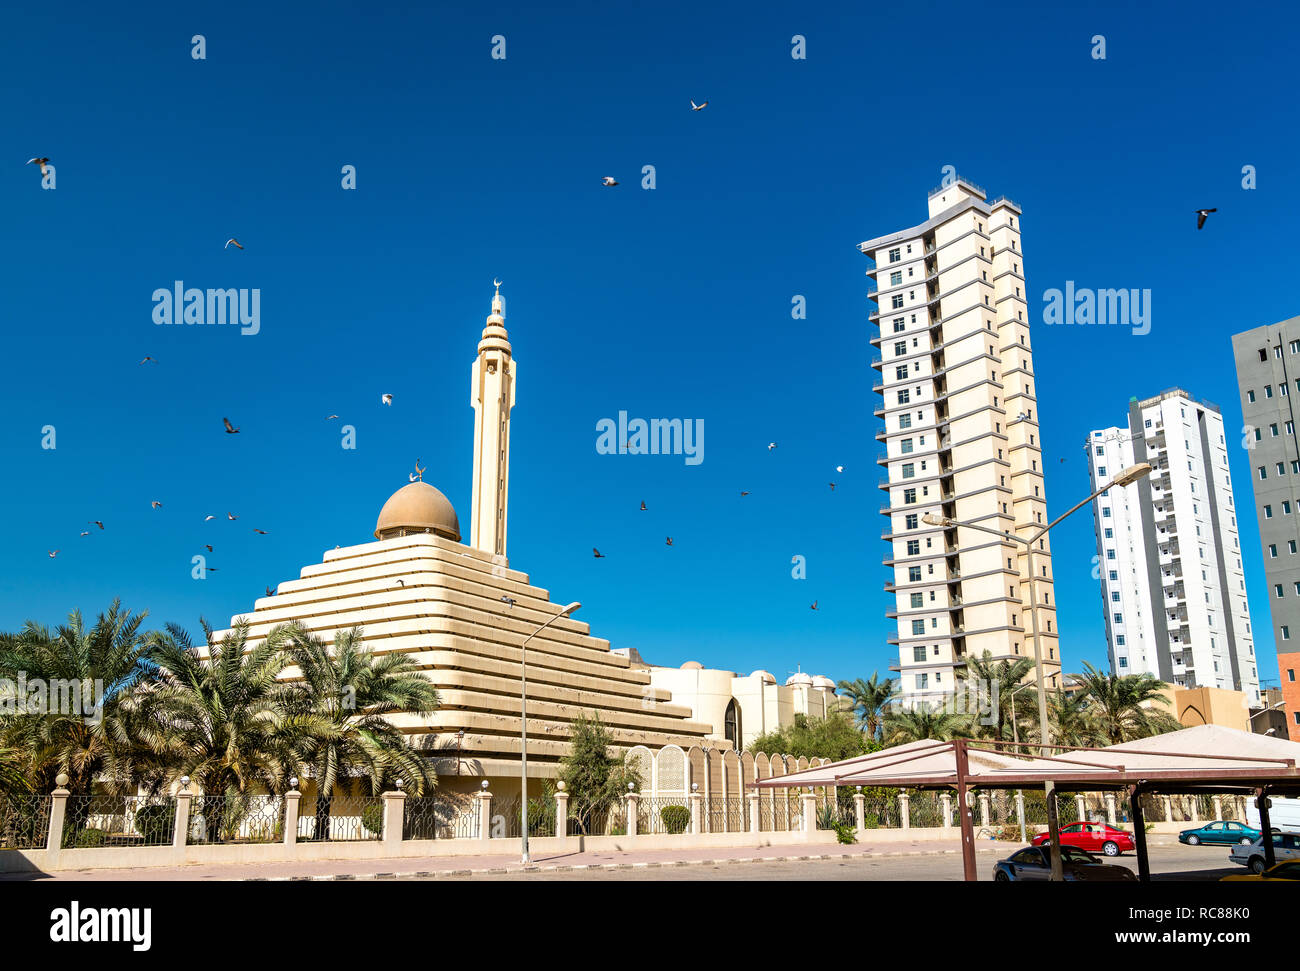 Shaikh Nasser al-Sabah Mosque in Kuwait - Stock Image